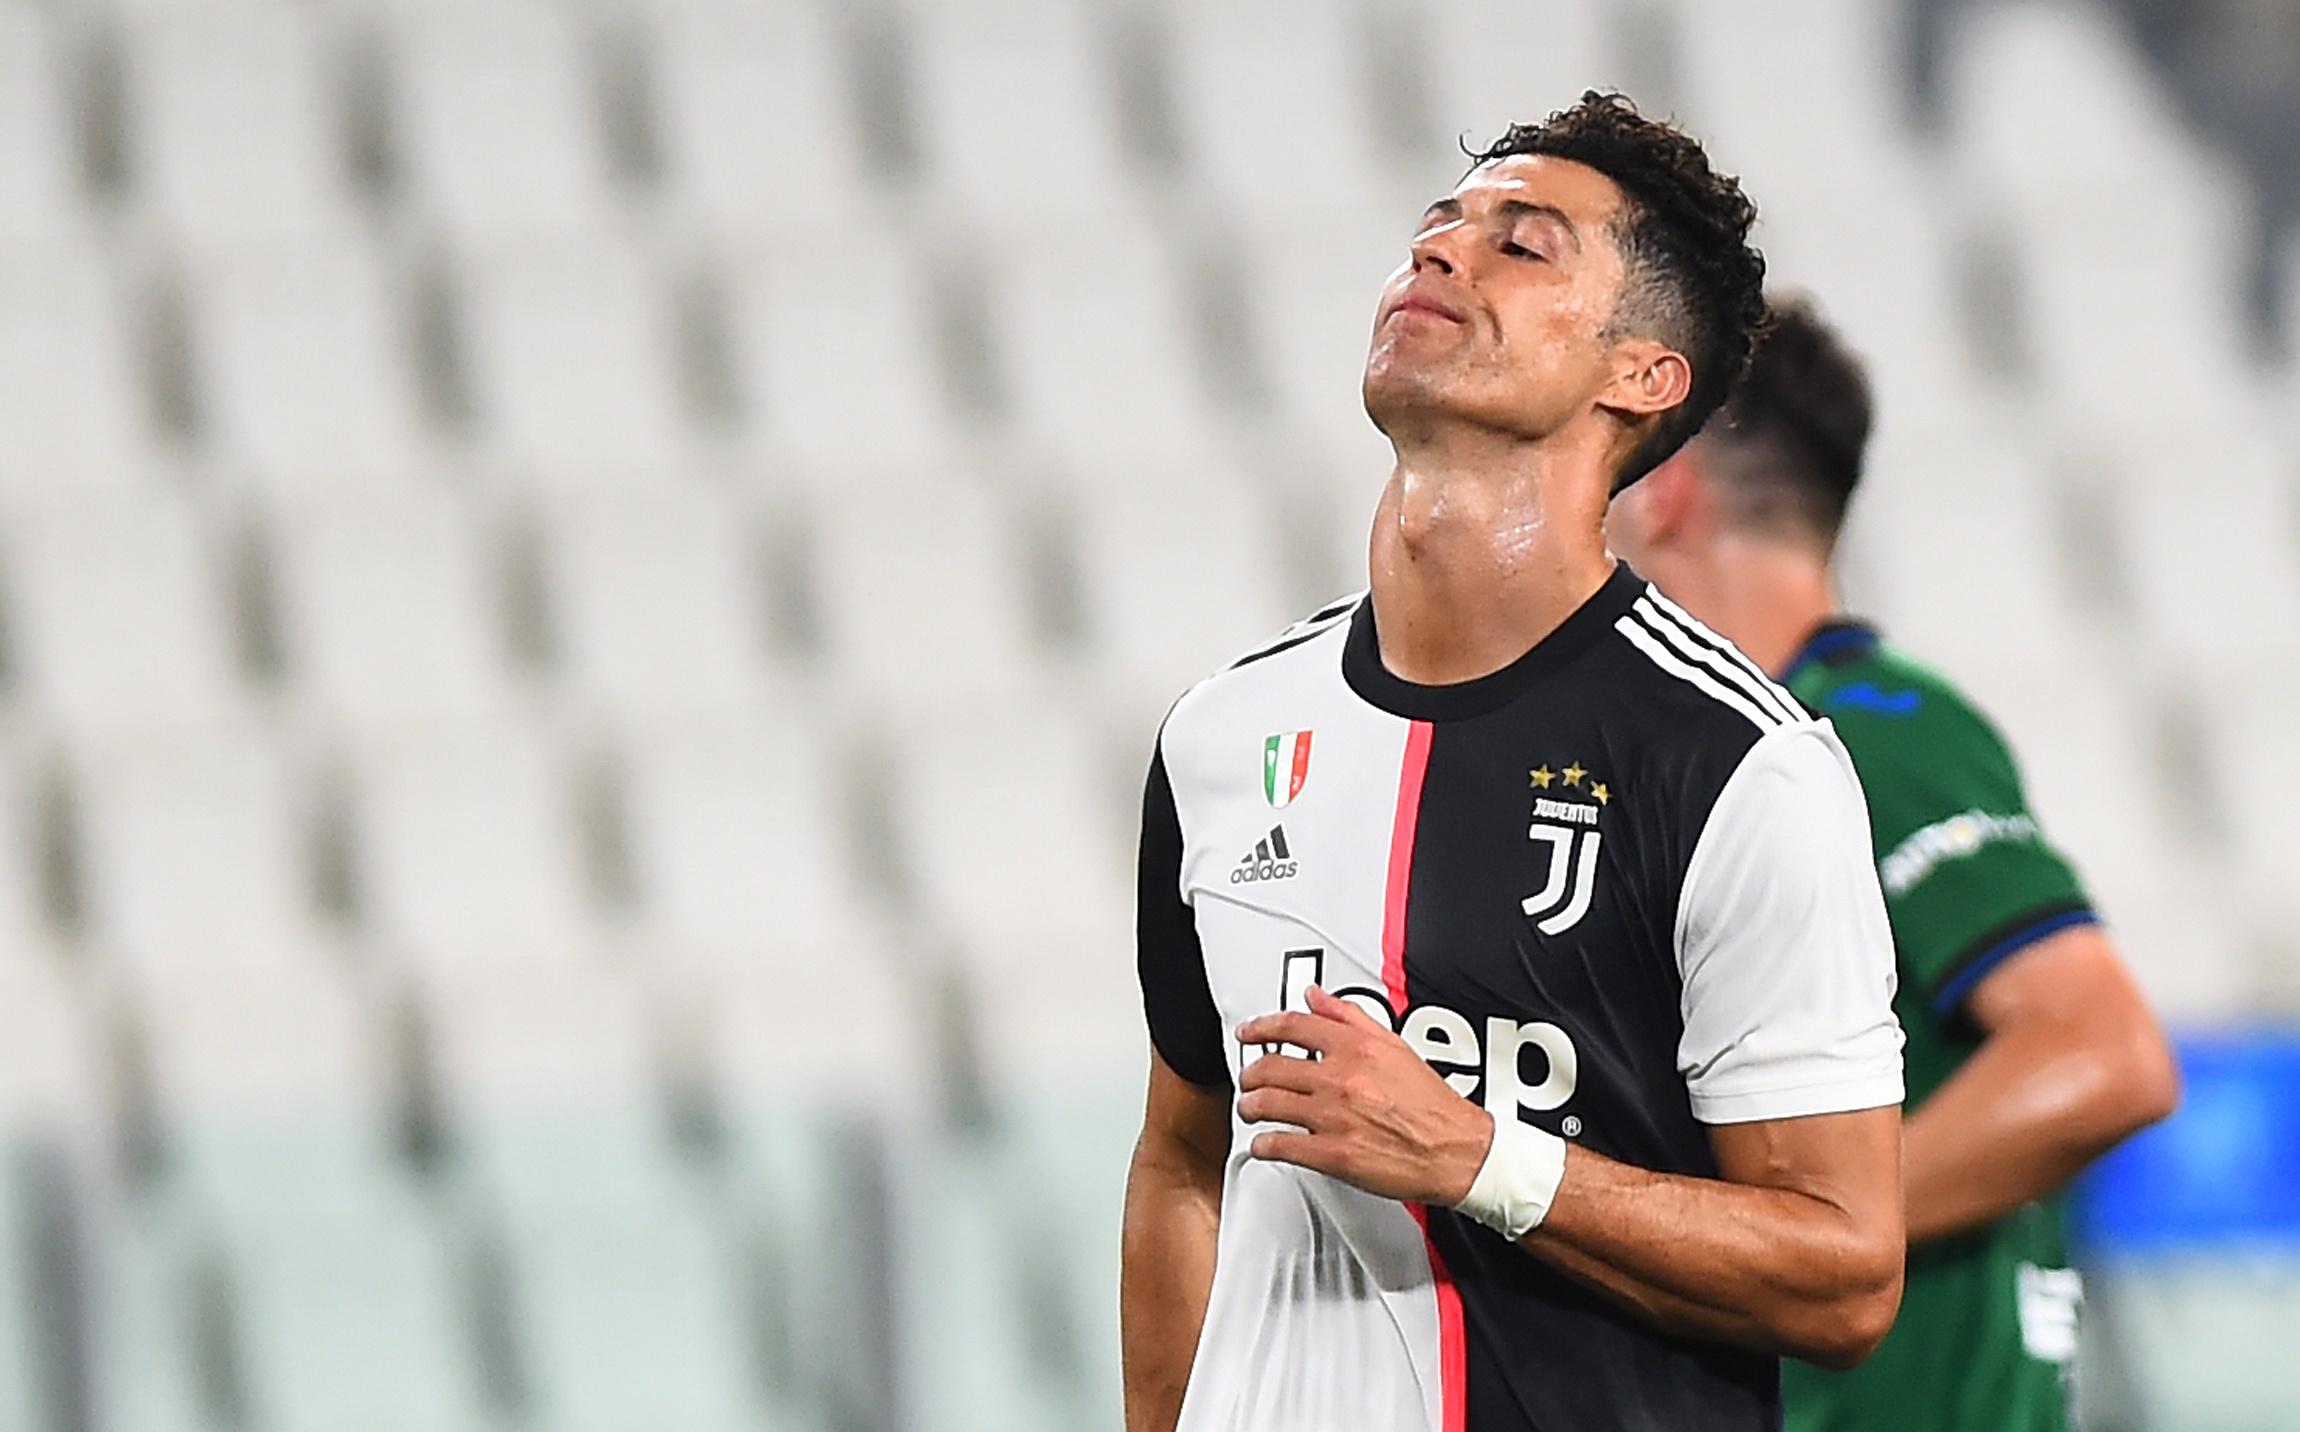 Cristiano Ronaldo (Juventus(/Foto REUTERS